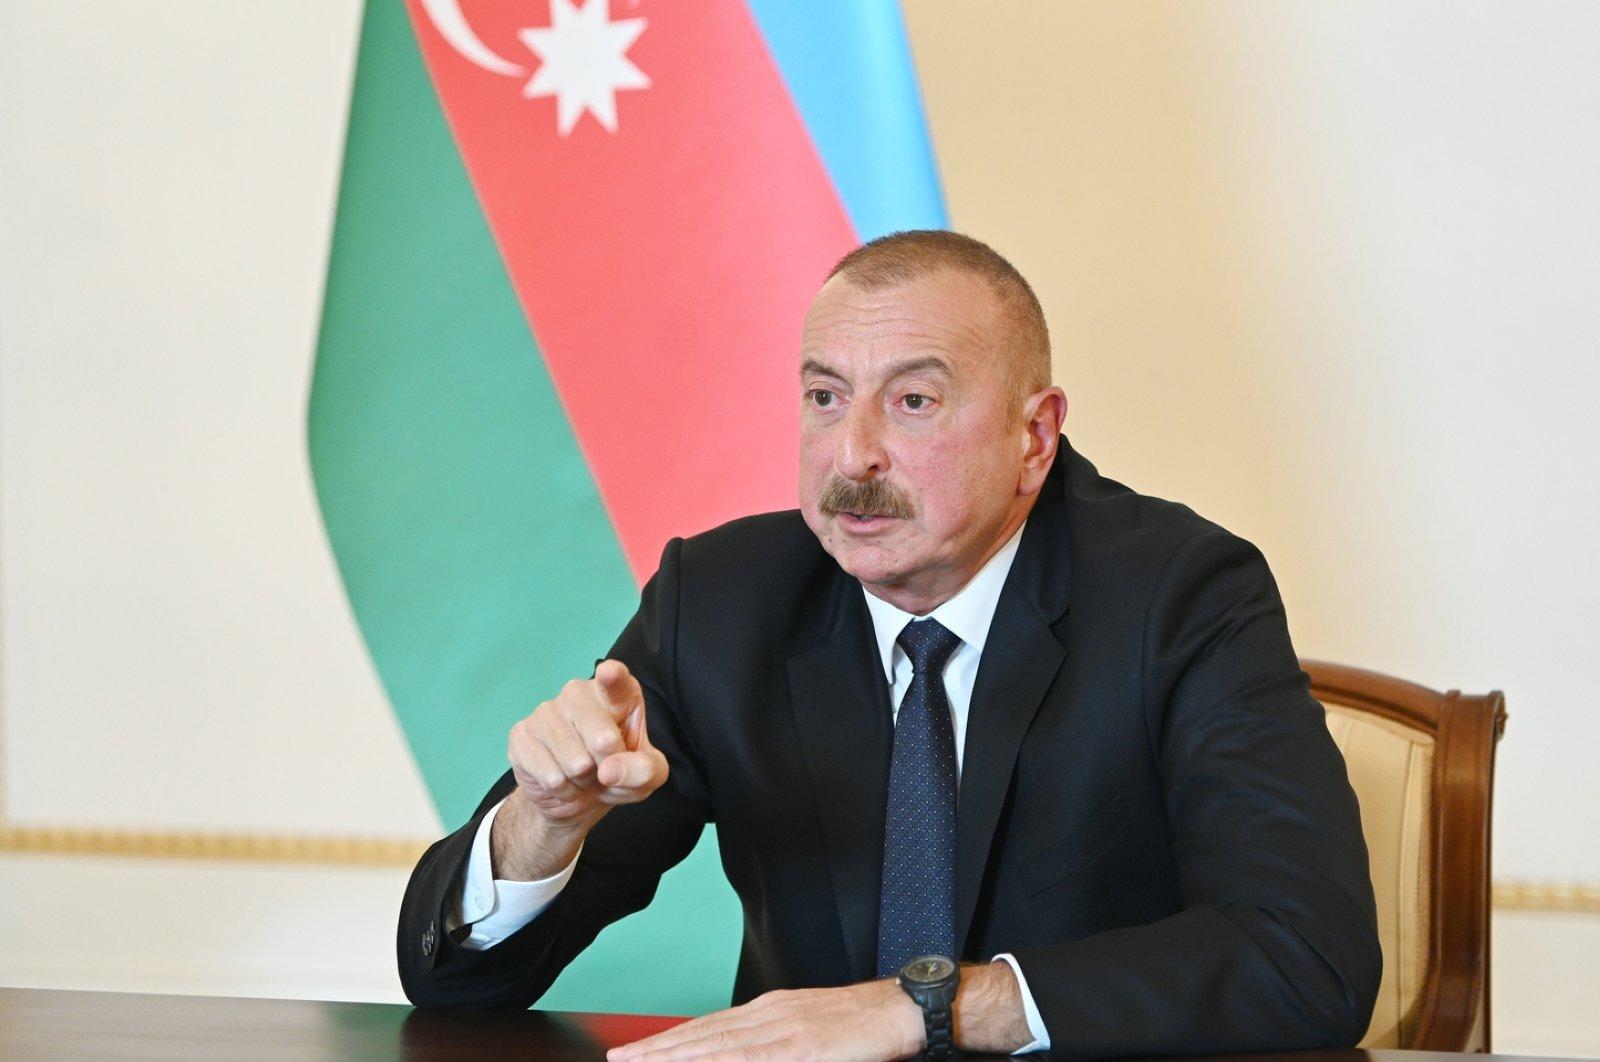 Azerbaijani President Ilham Aliyev holds a televised address to the nation in Baku, Oct. 4, 2020. (AFP Photo / Azerbaijani Presidency / Handout)